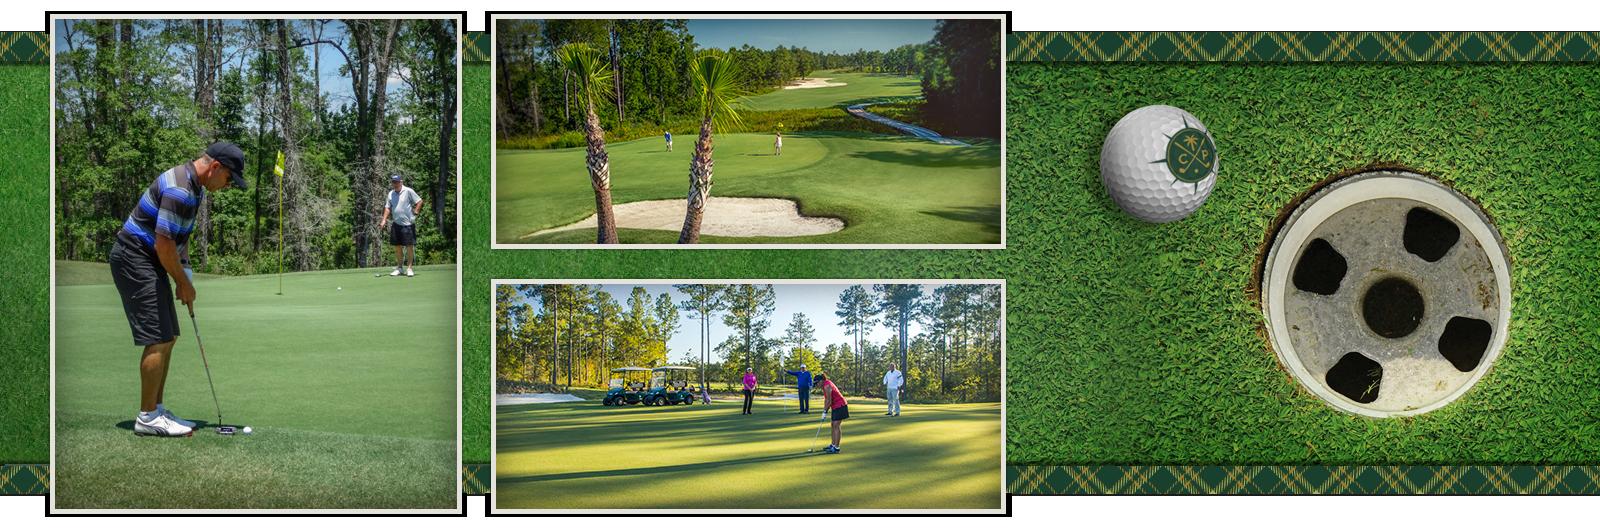 Compass Pointe Golf Club, Leland, NC